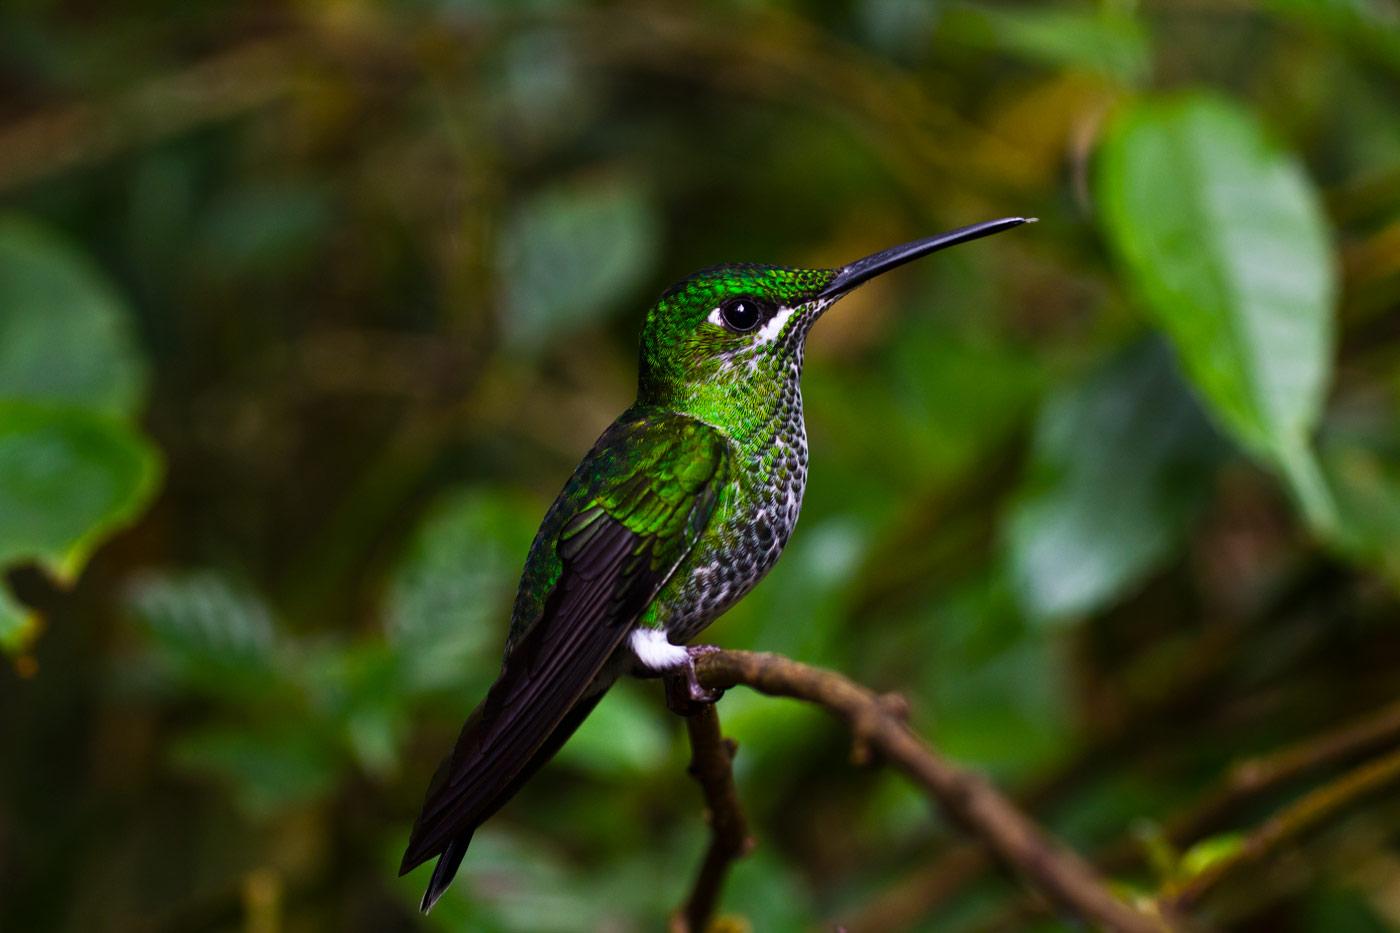 Nick-Zantop-Photography-Rainforest-3